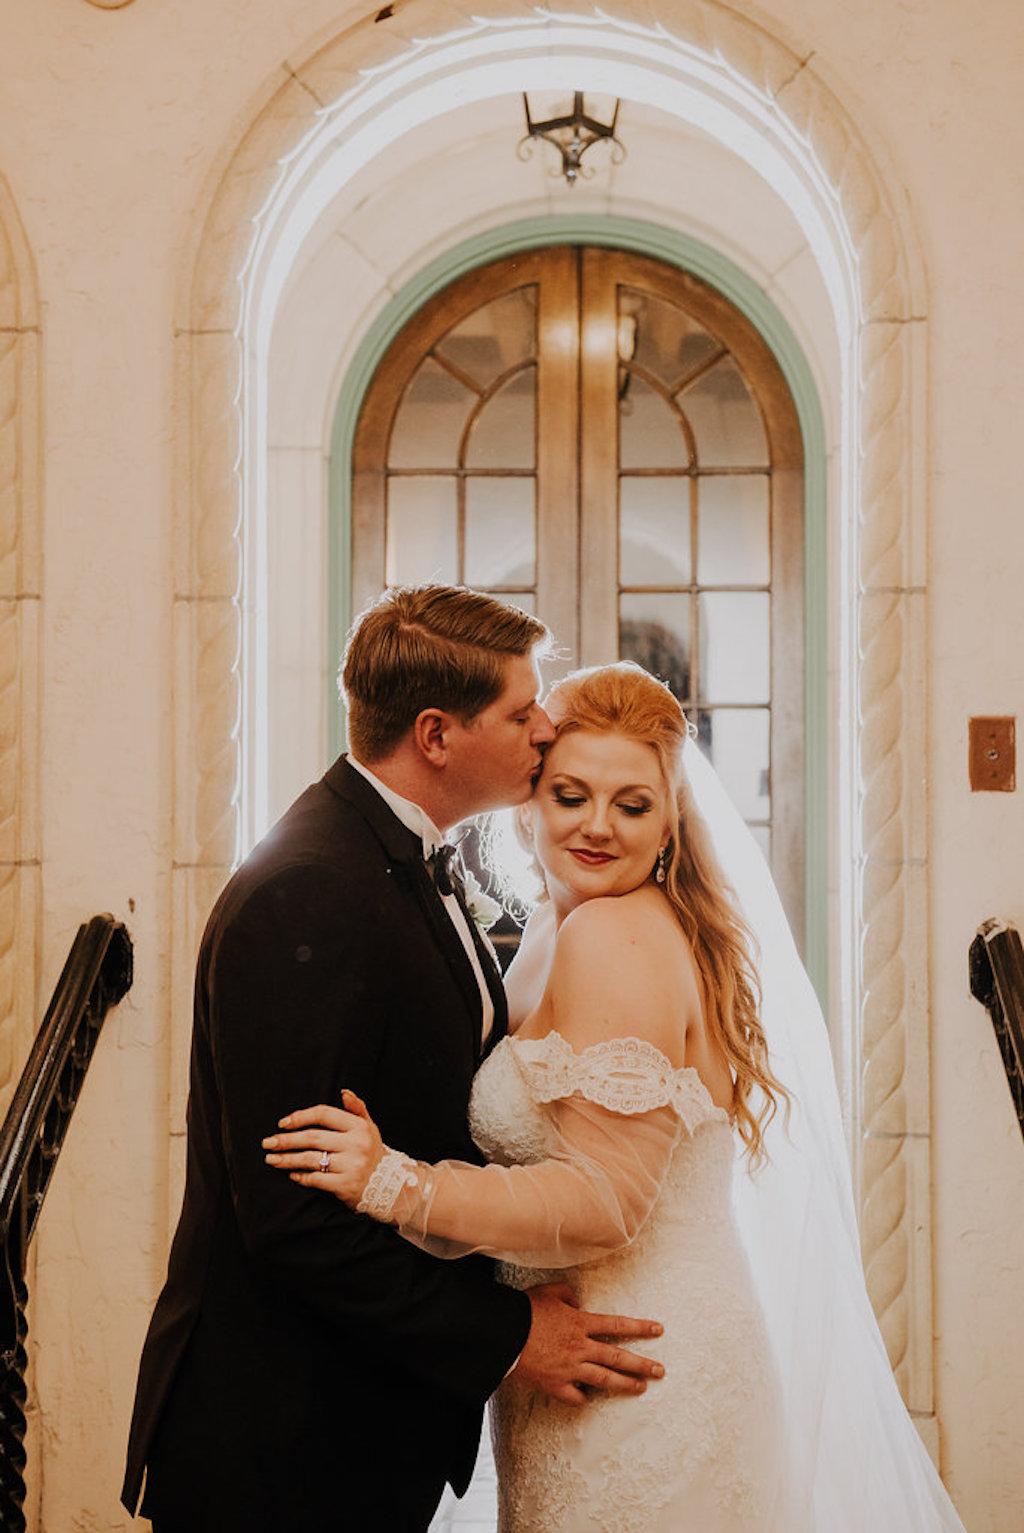 Architectural Wedding Portrait, Bride in Lace Long Sleeve Essence of Australia Dress | Sarasota Wedding Venue Crosley Powel Estate